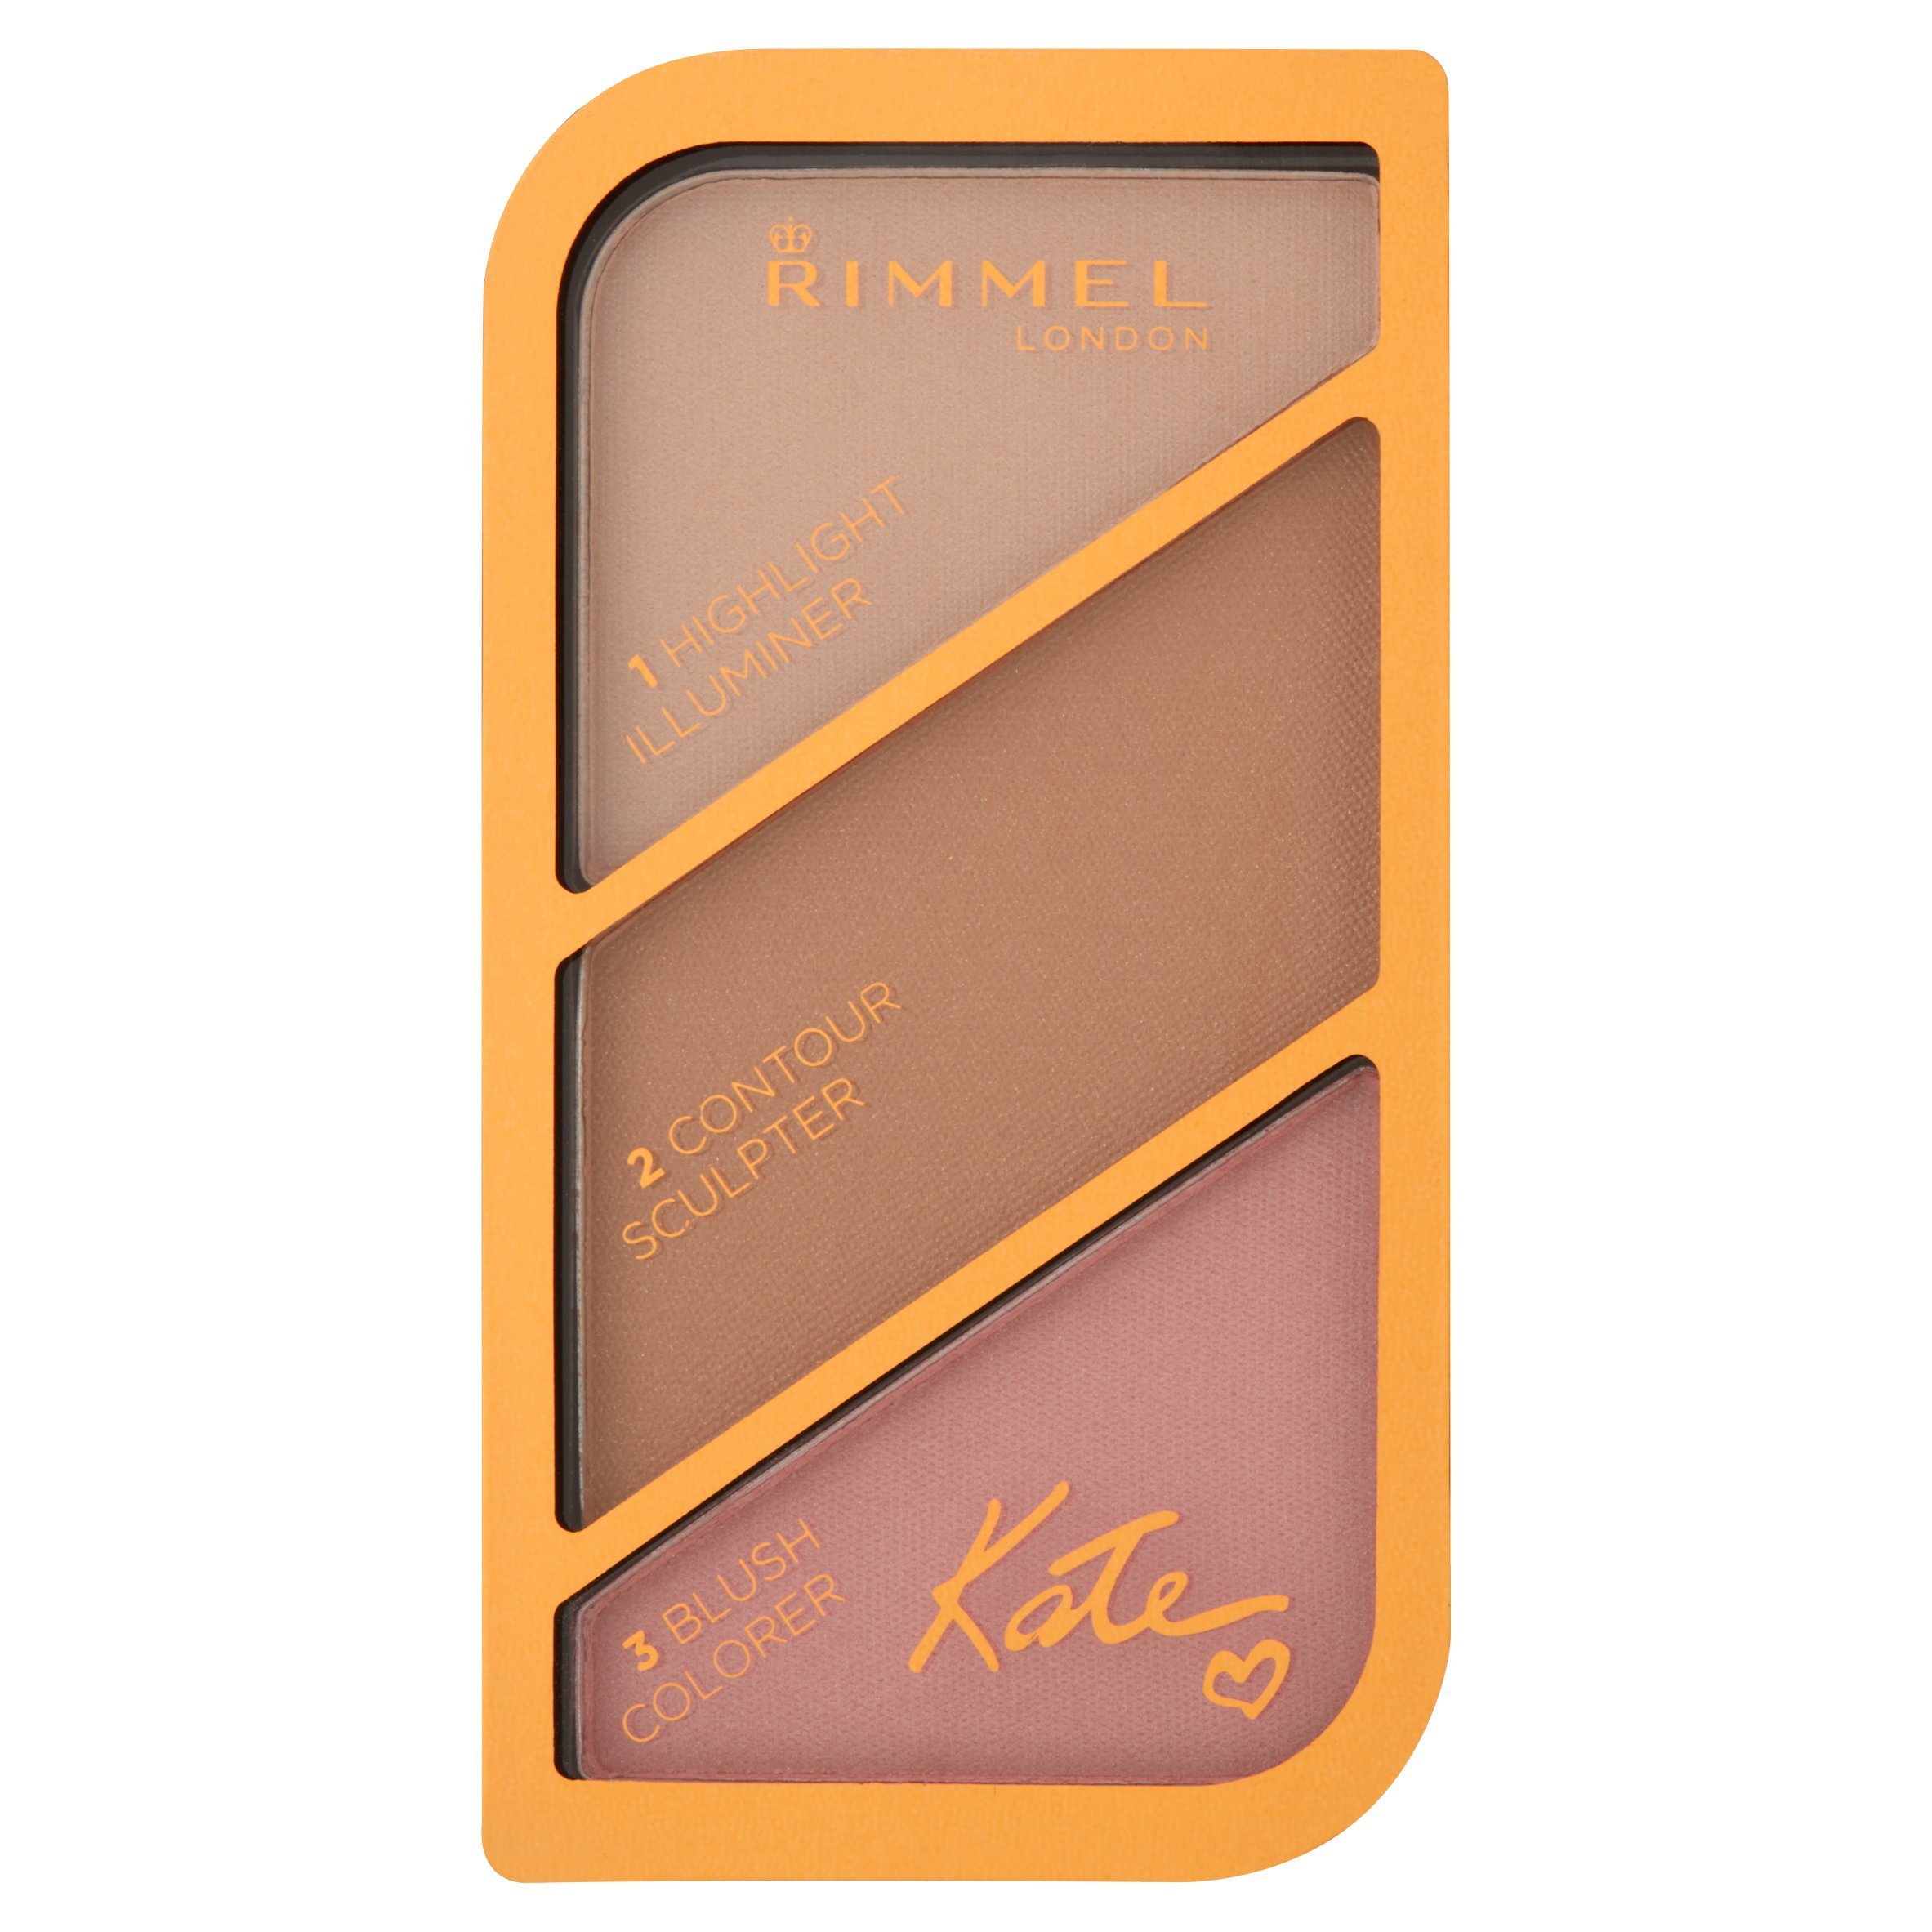 Rimmel London Kate 001 Golden Sands Sculpting Palette, 0.65 oz